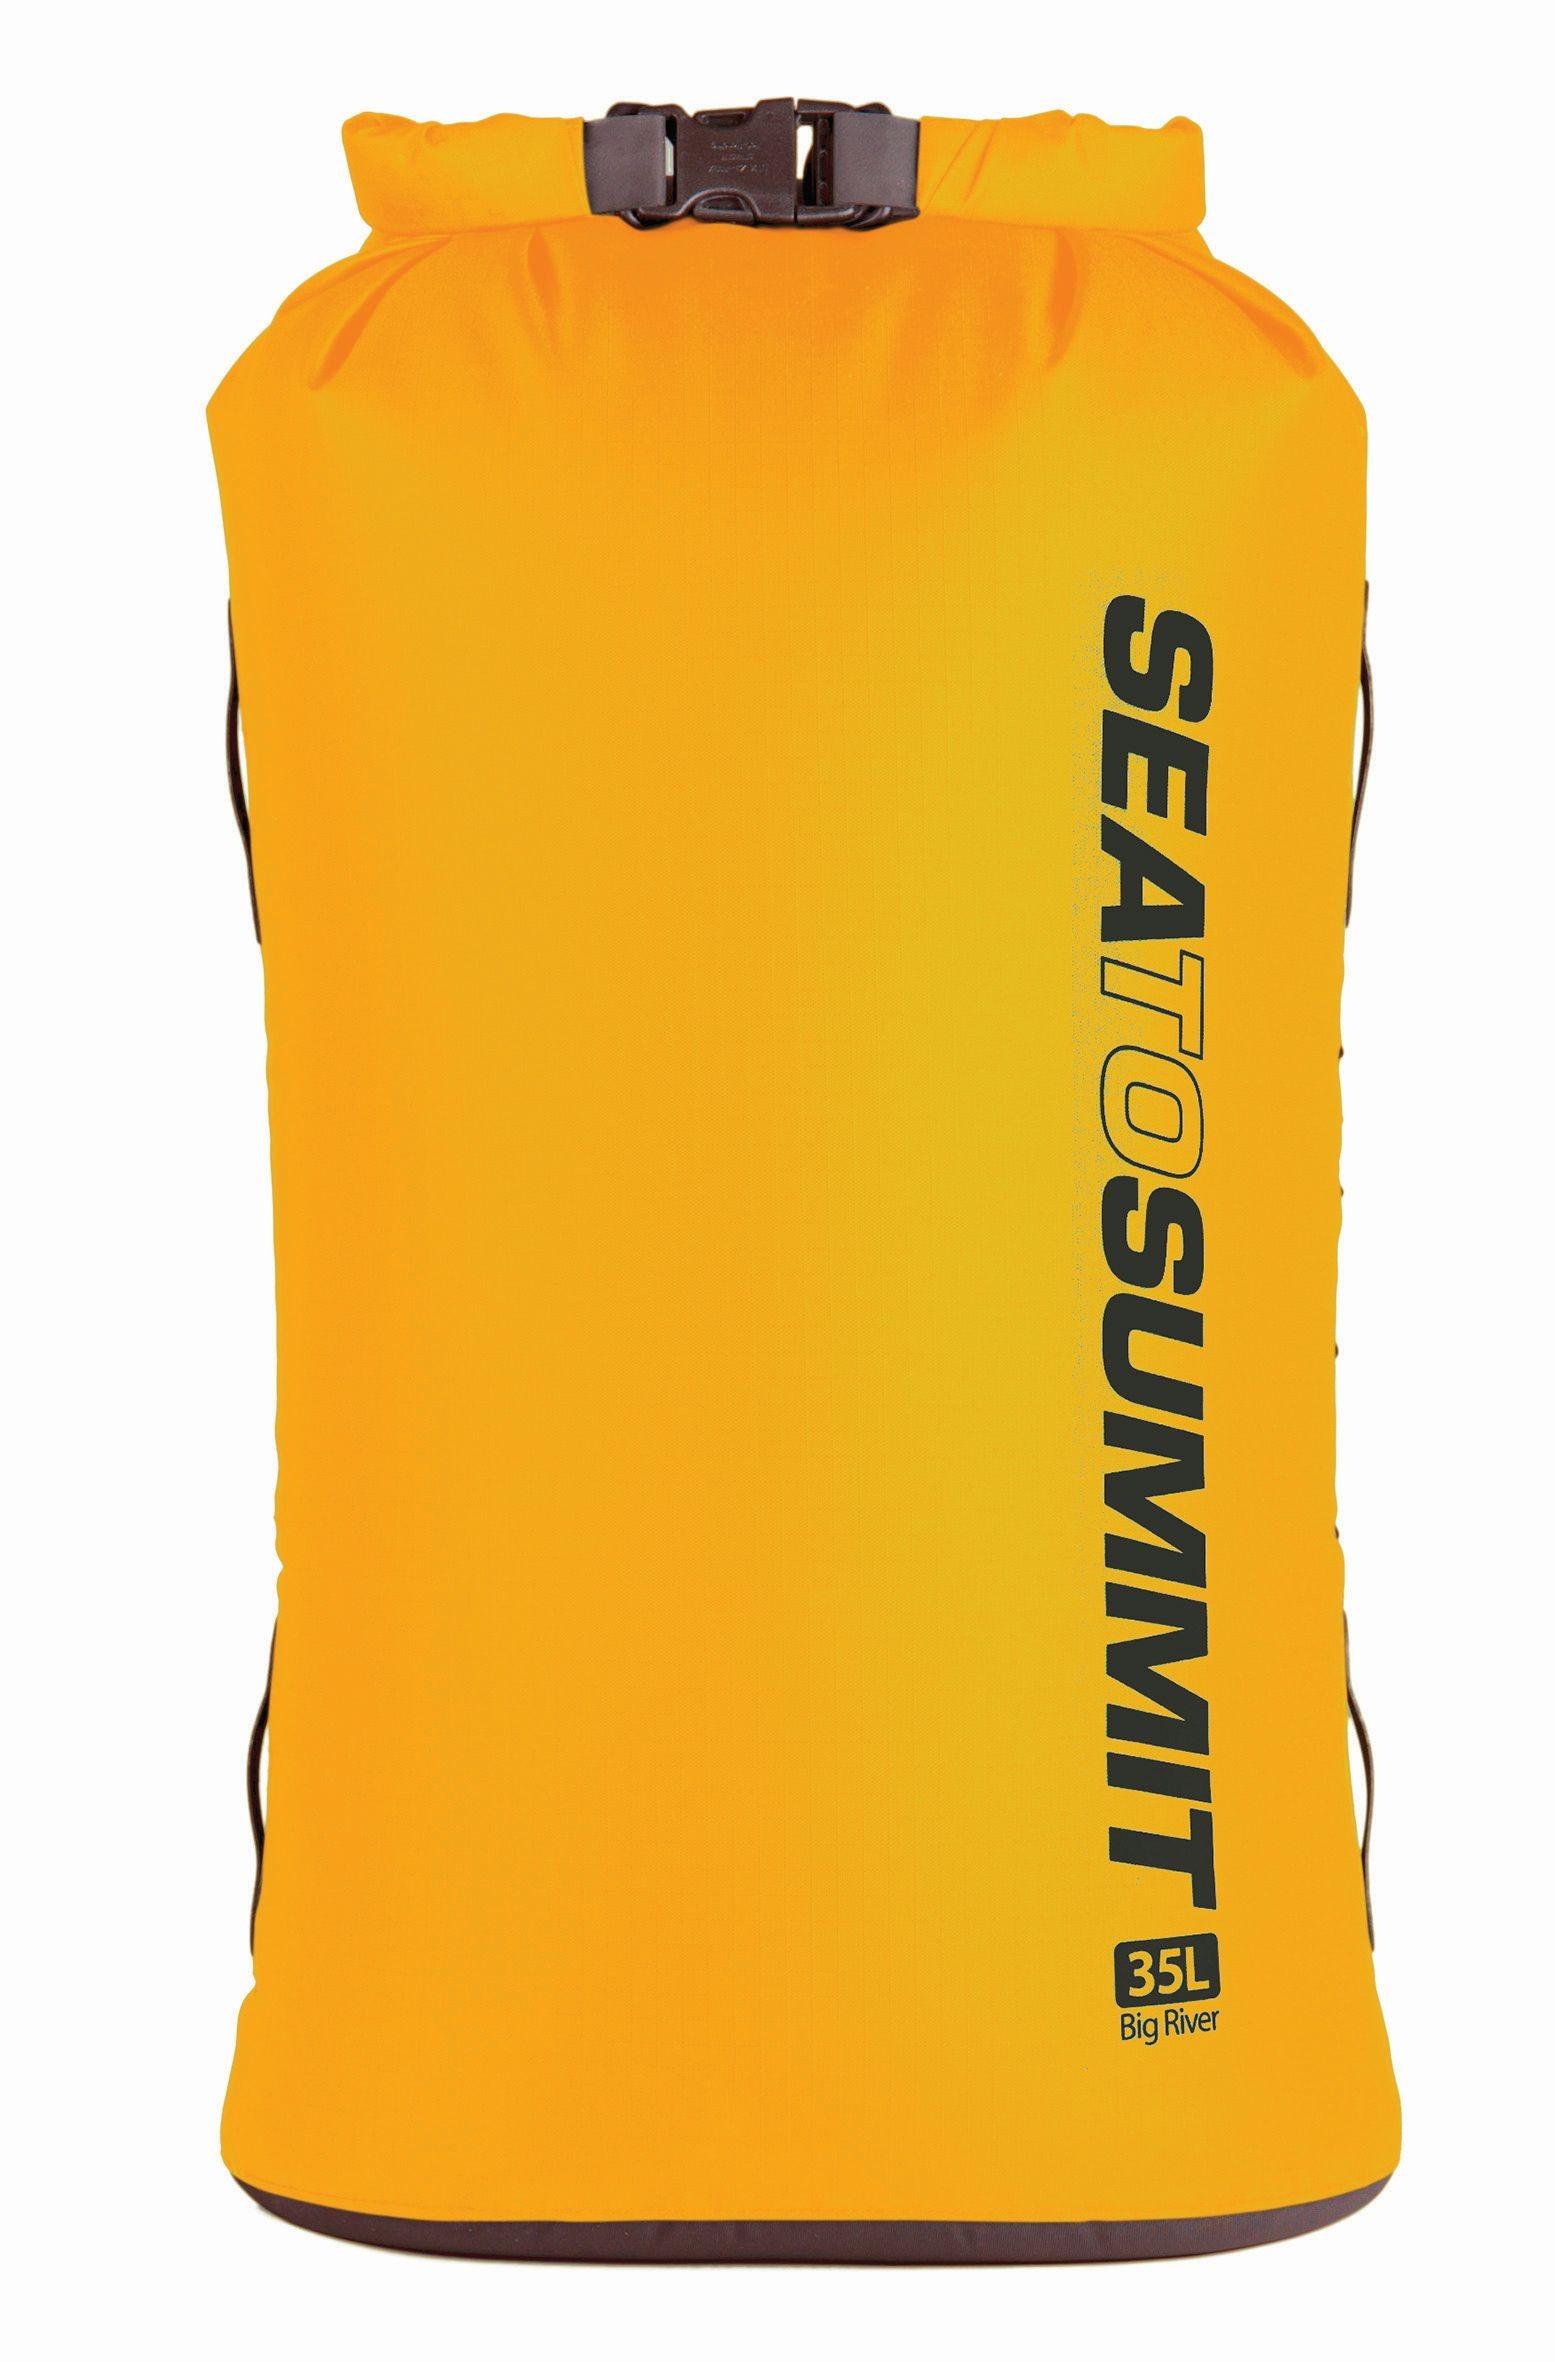 Sea To Summit Big River Dry Bag - 35 L